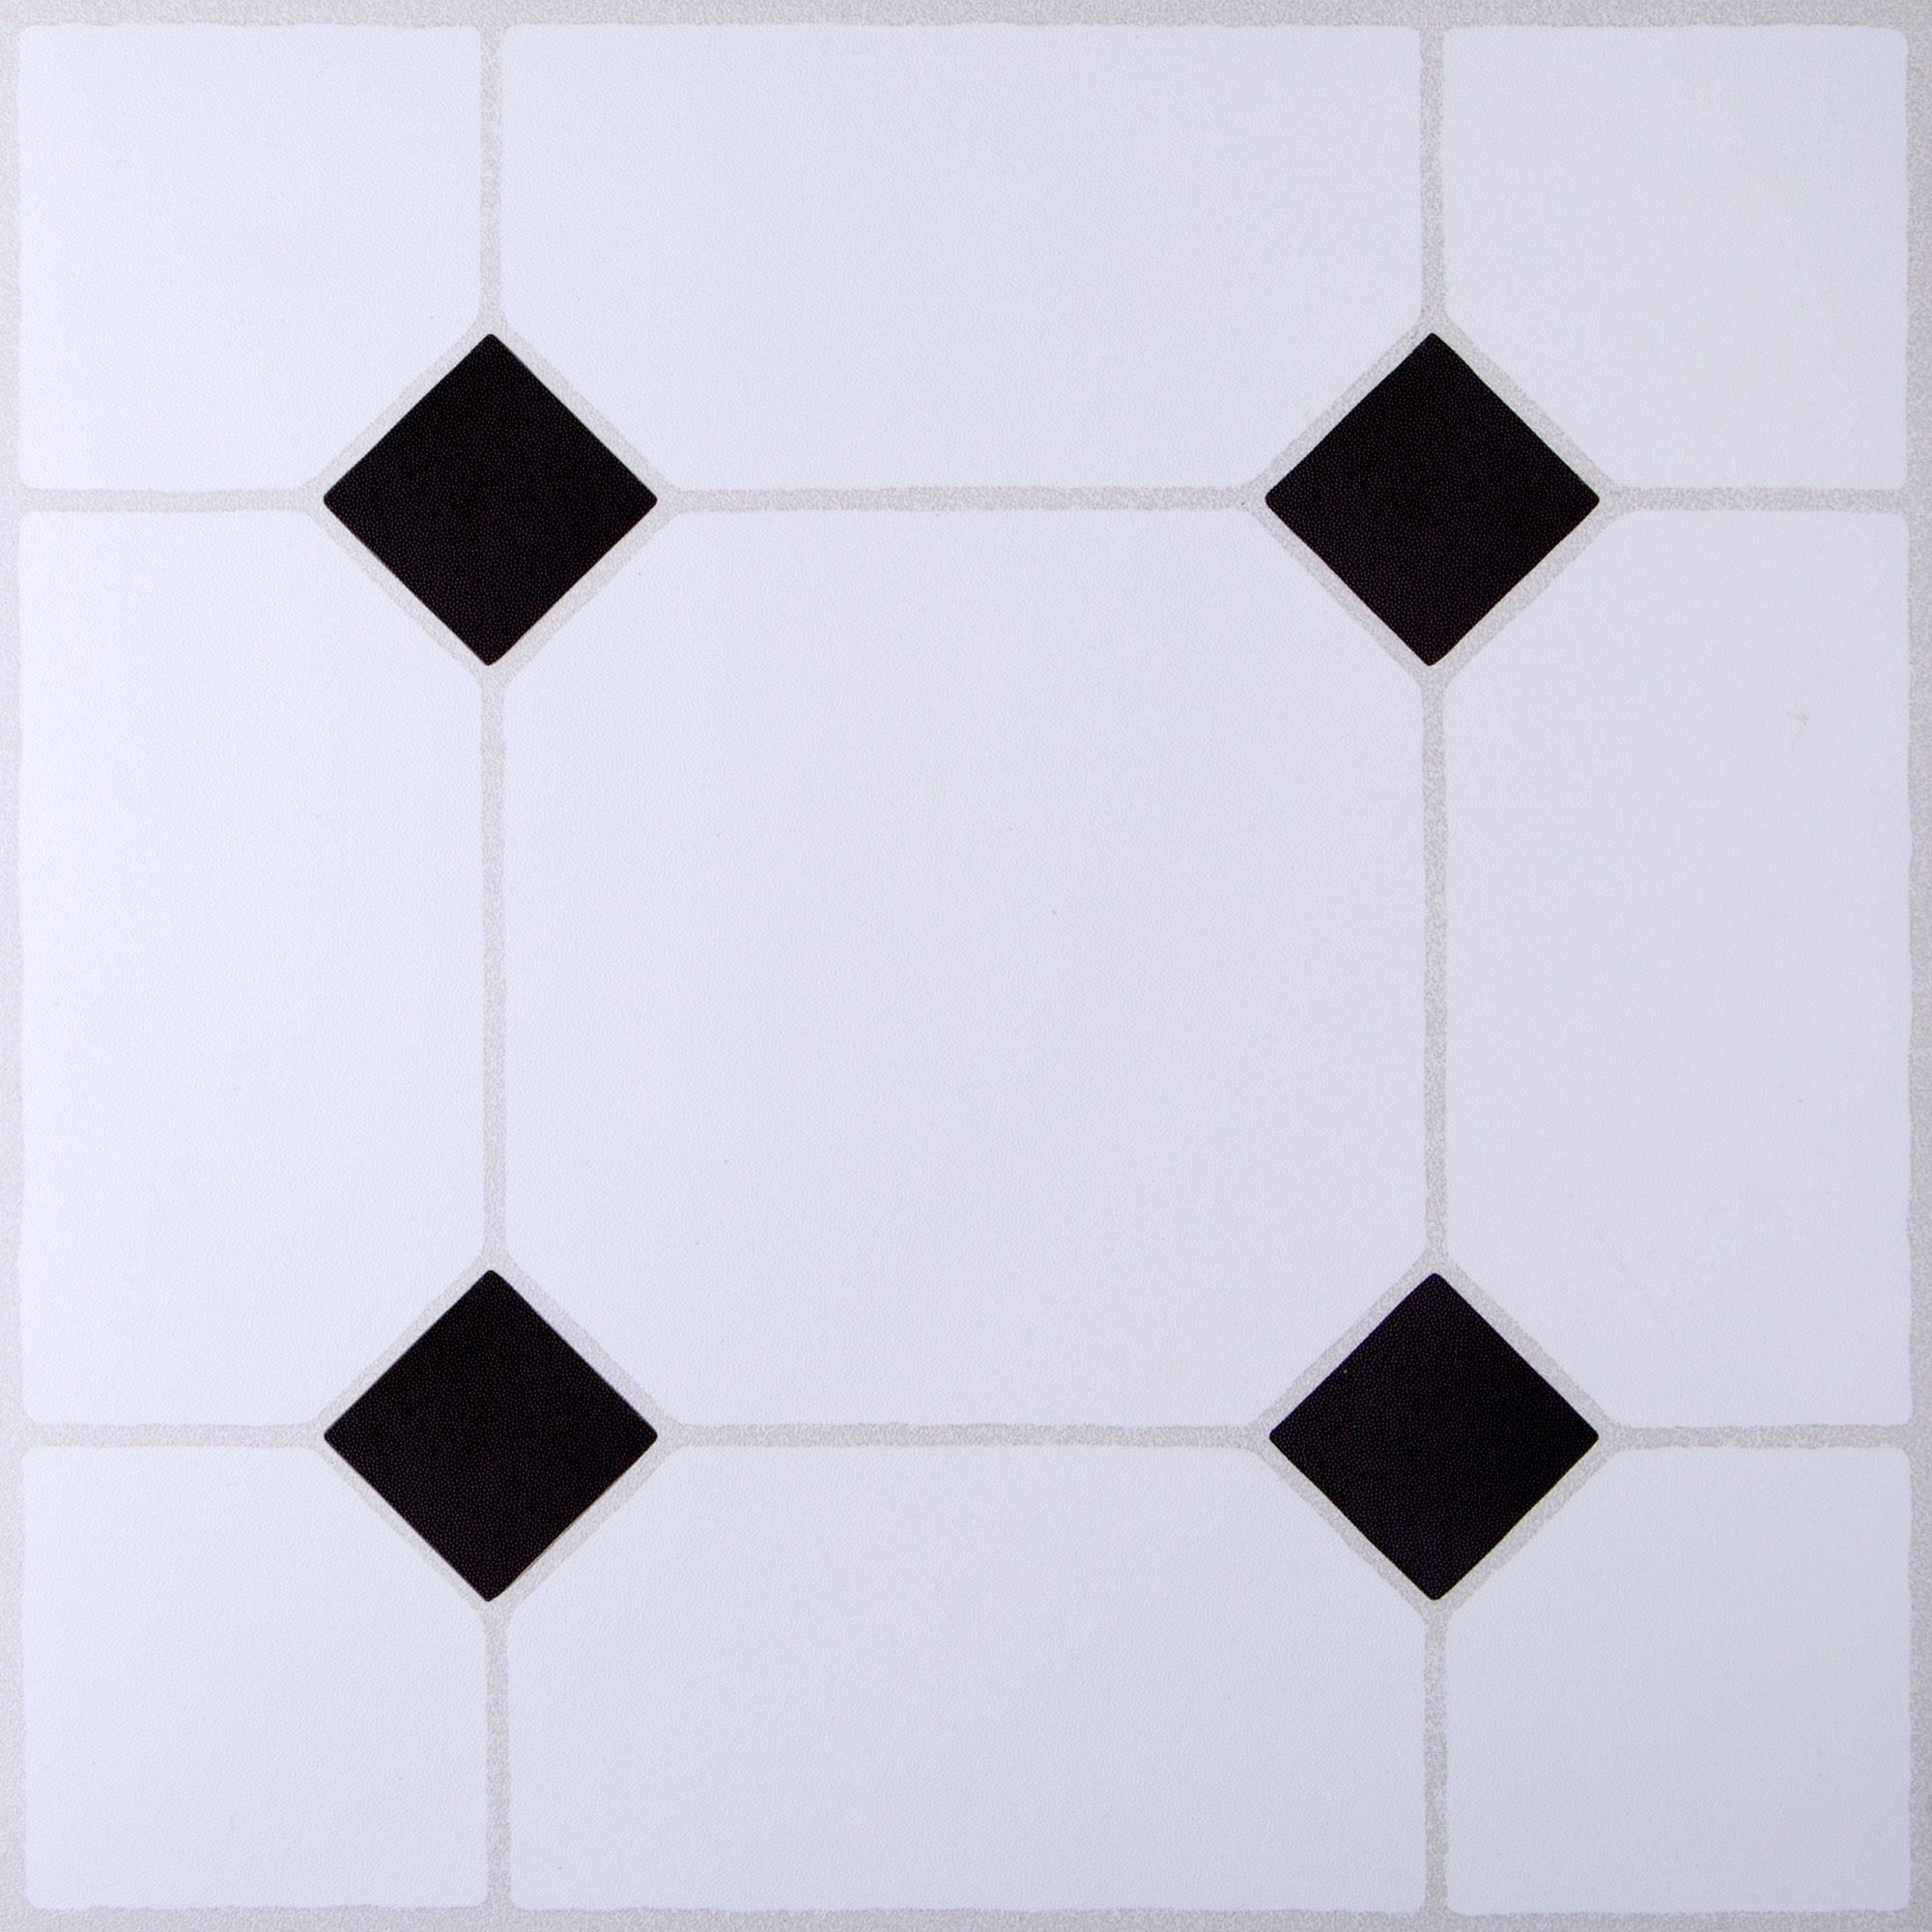 Bq black white tile effect self adhesive vinyl tile 102m pack bq black white tile effect self adhesive vinyl tile pack 102m departments dailygadgetfo Choice Image